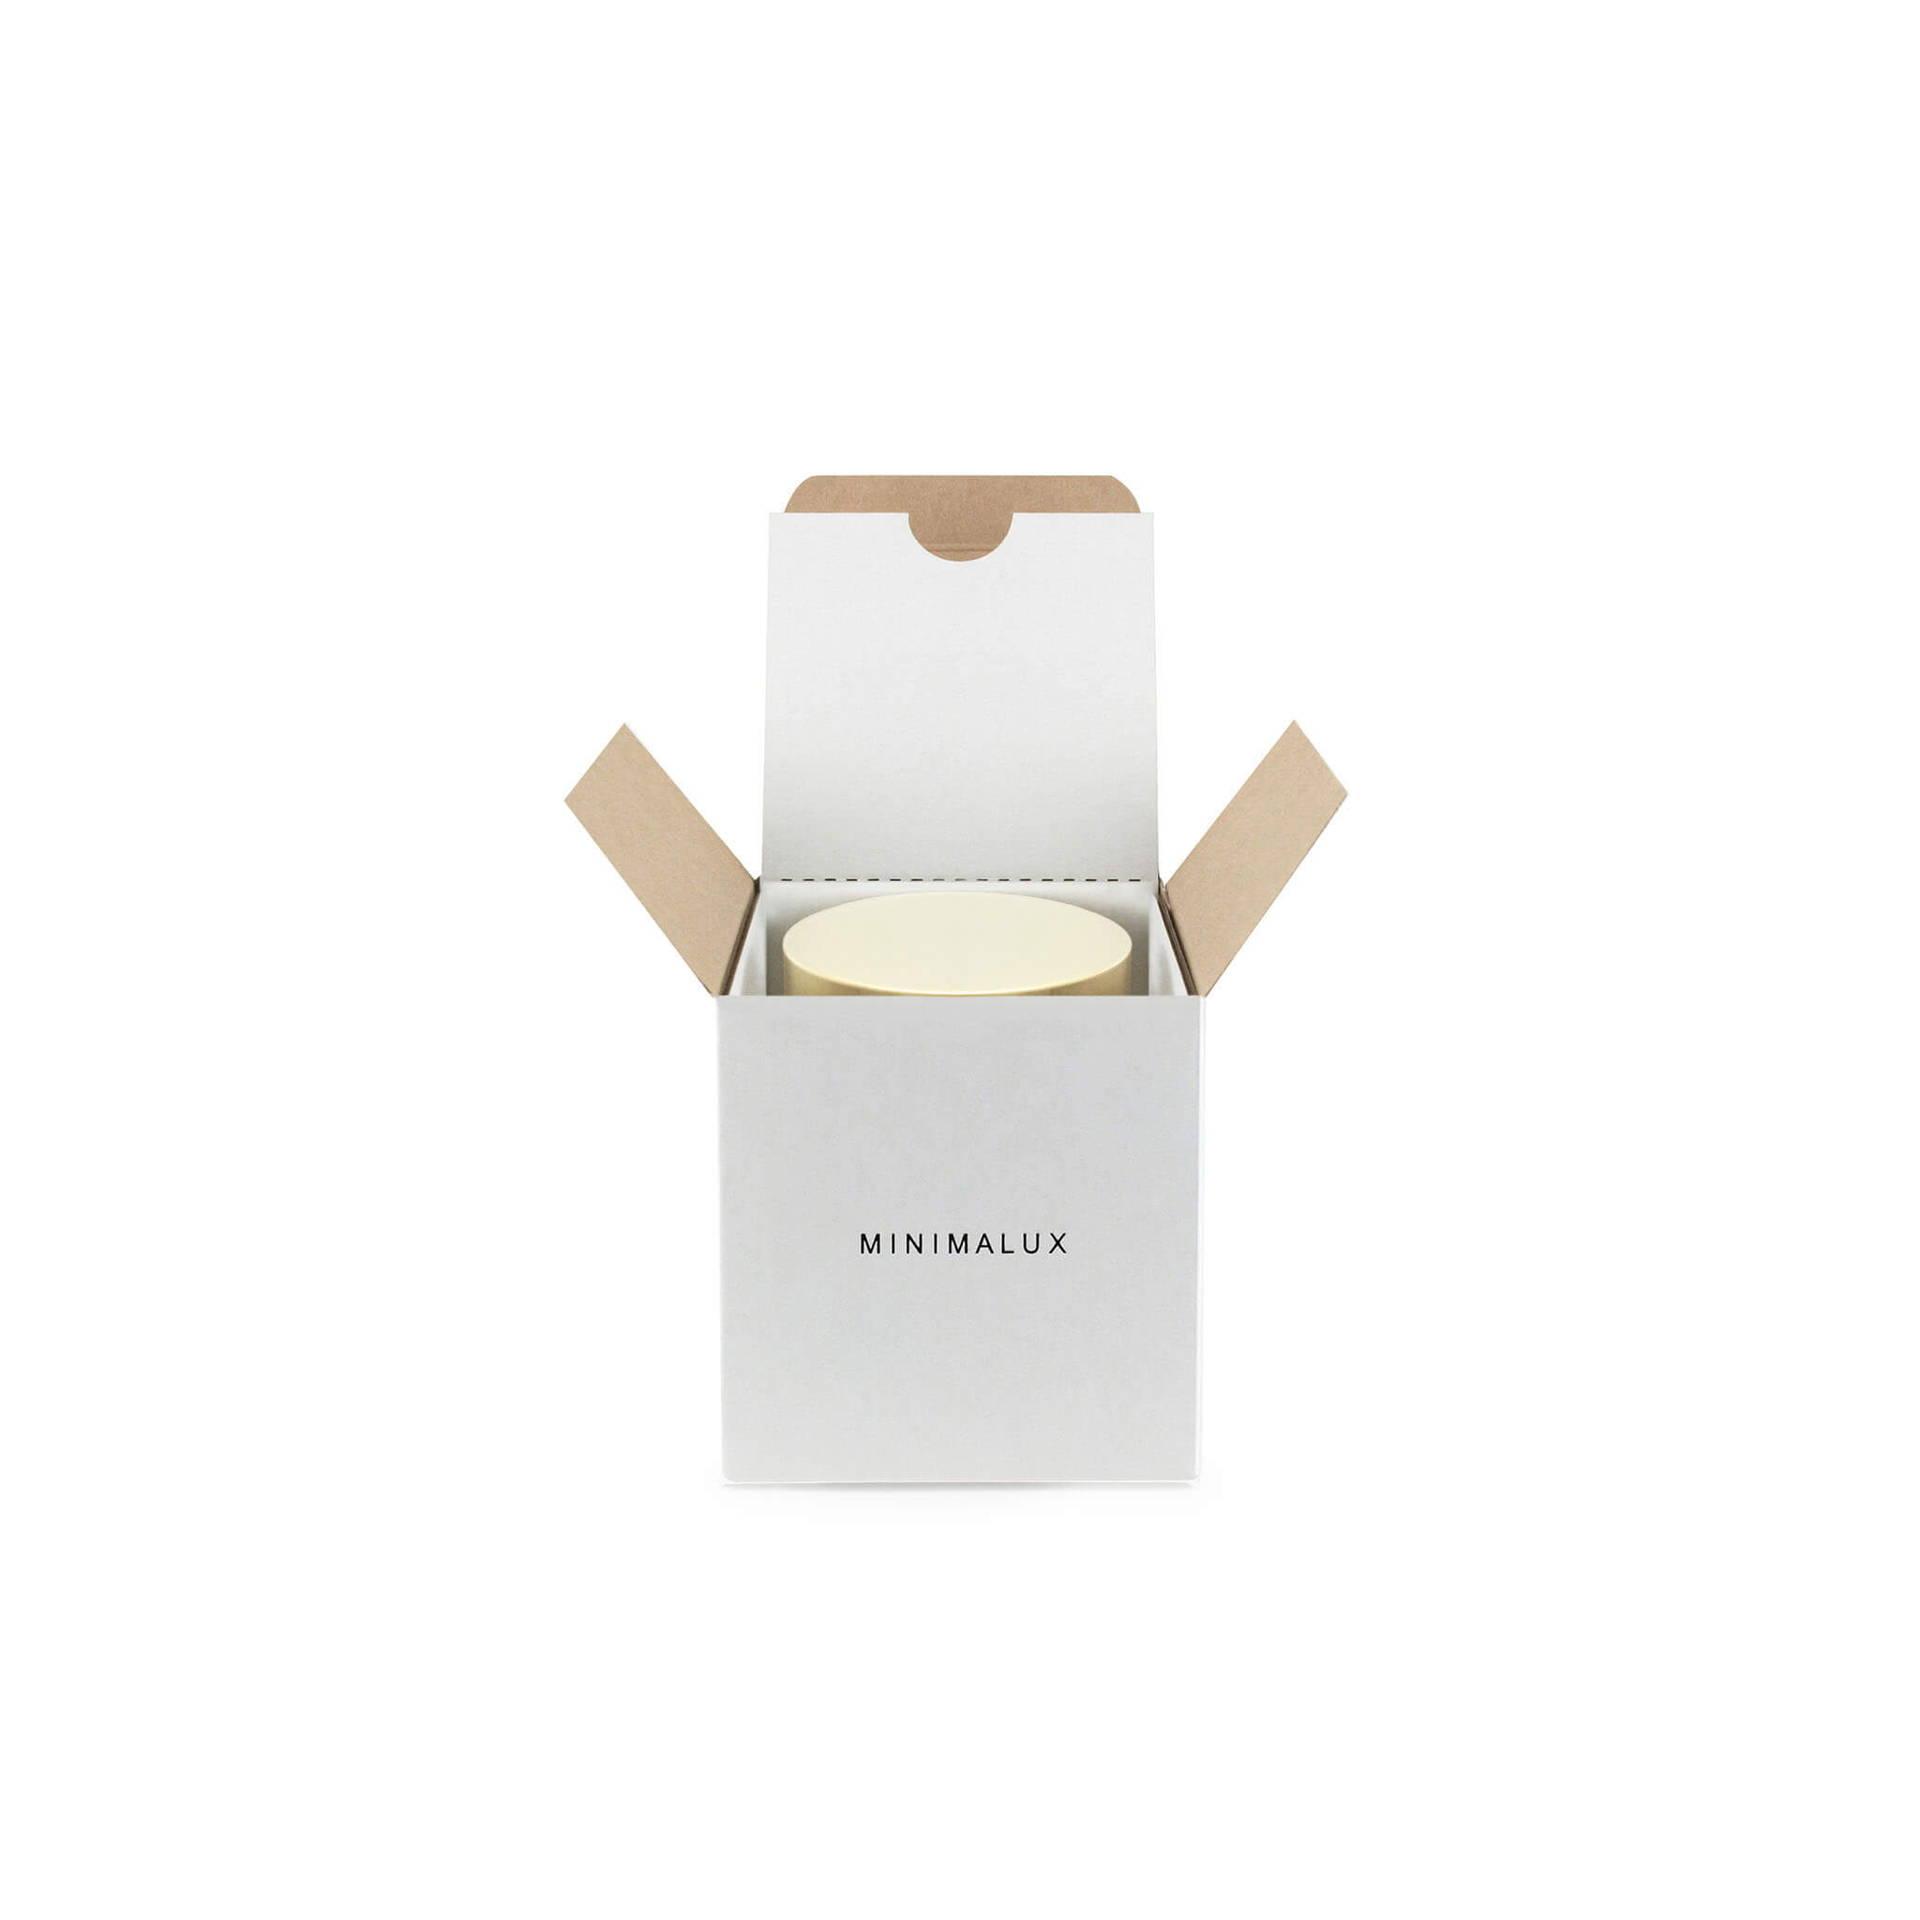 Pot 60 + Lid Packaging